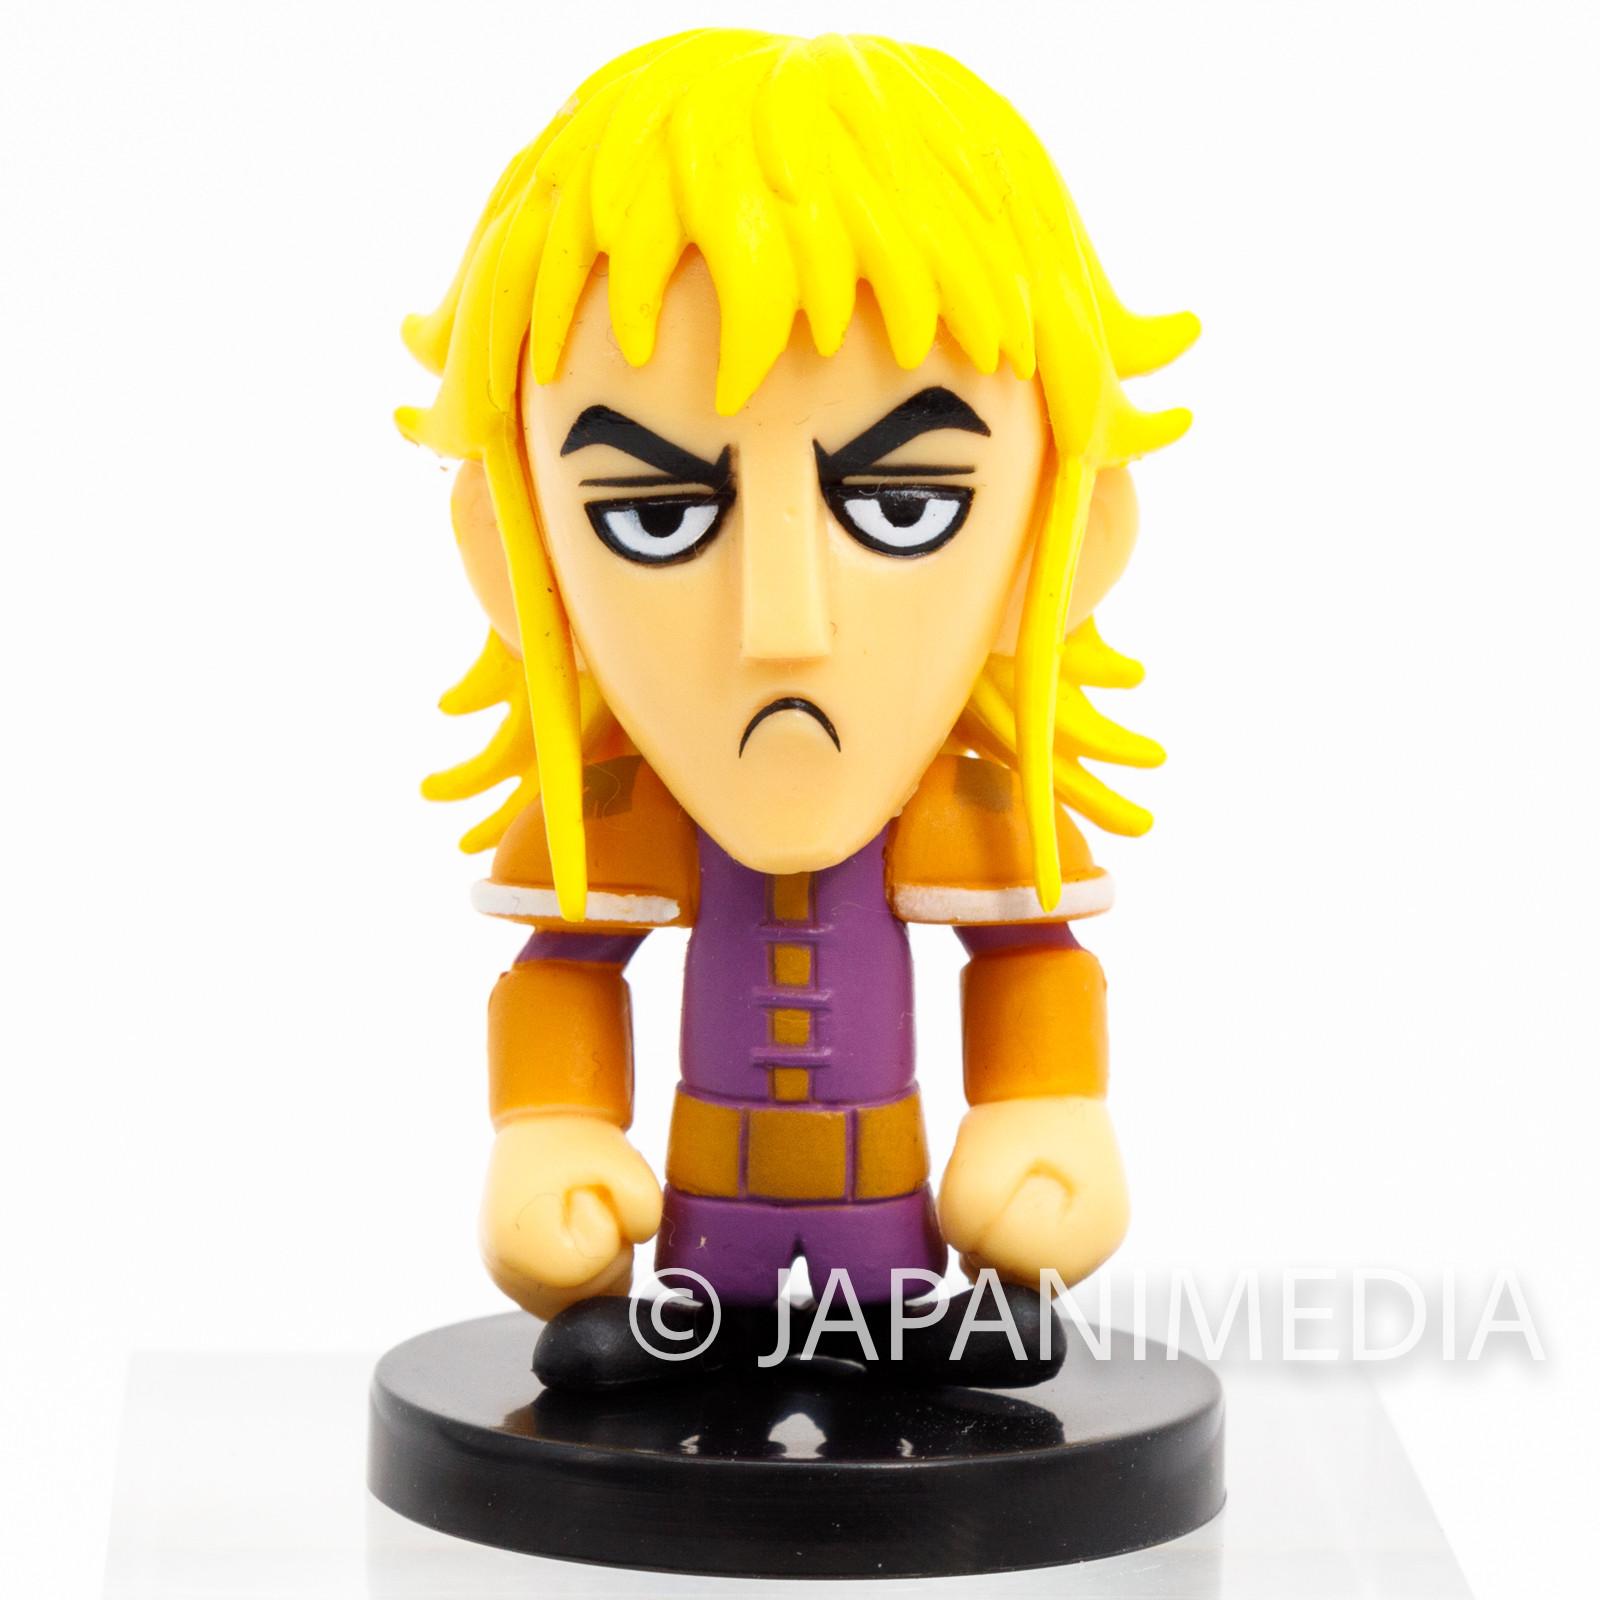 Fist of the North Star SHIN Mini Figure JAPAN ANIME Hokuto no Ken